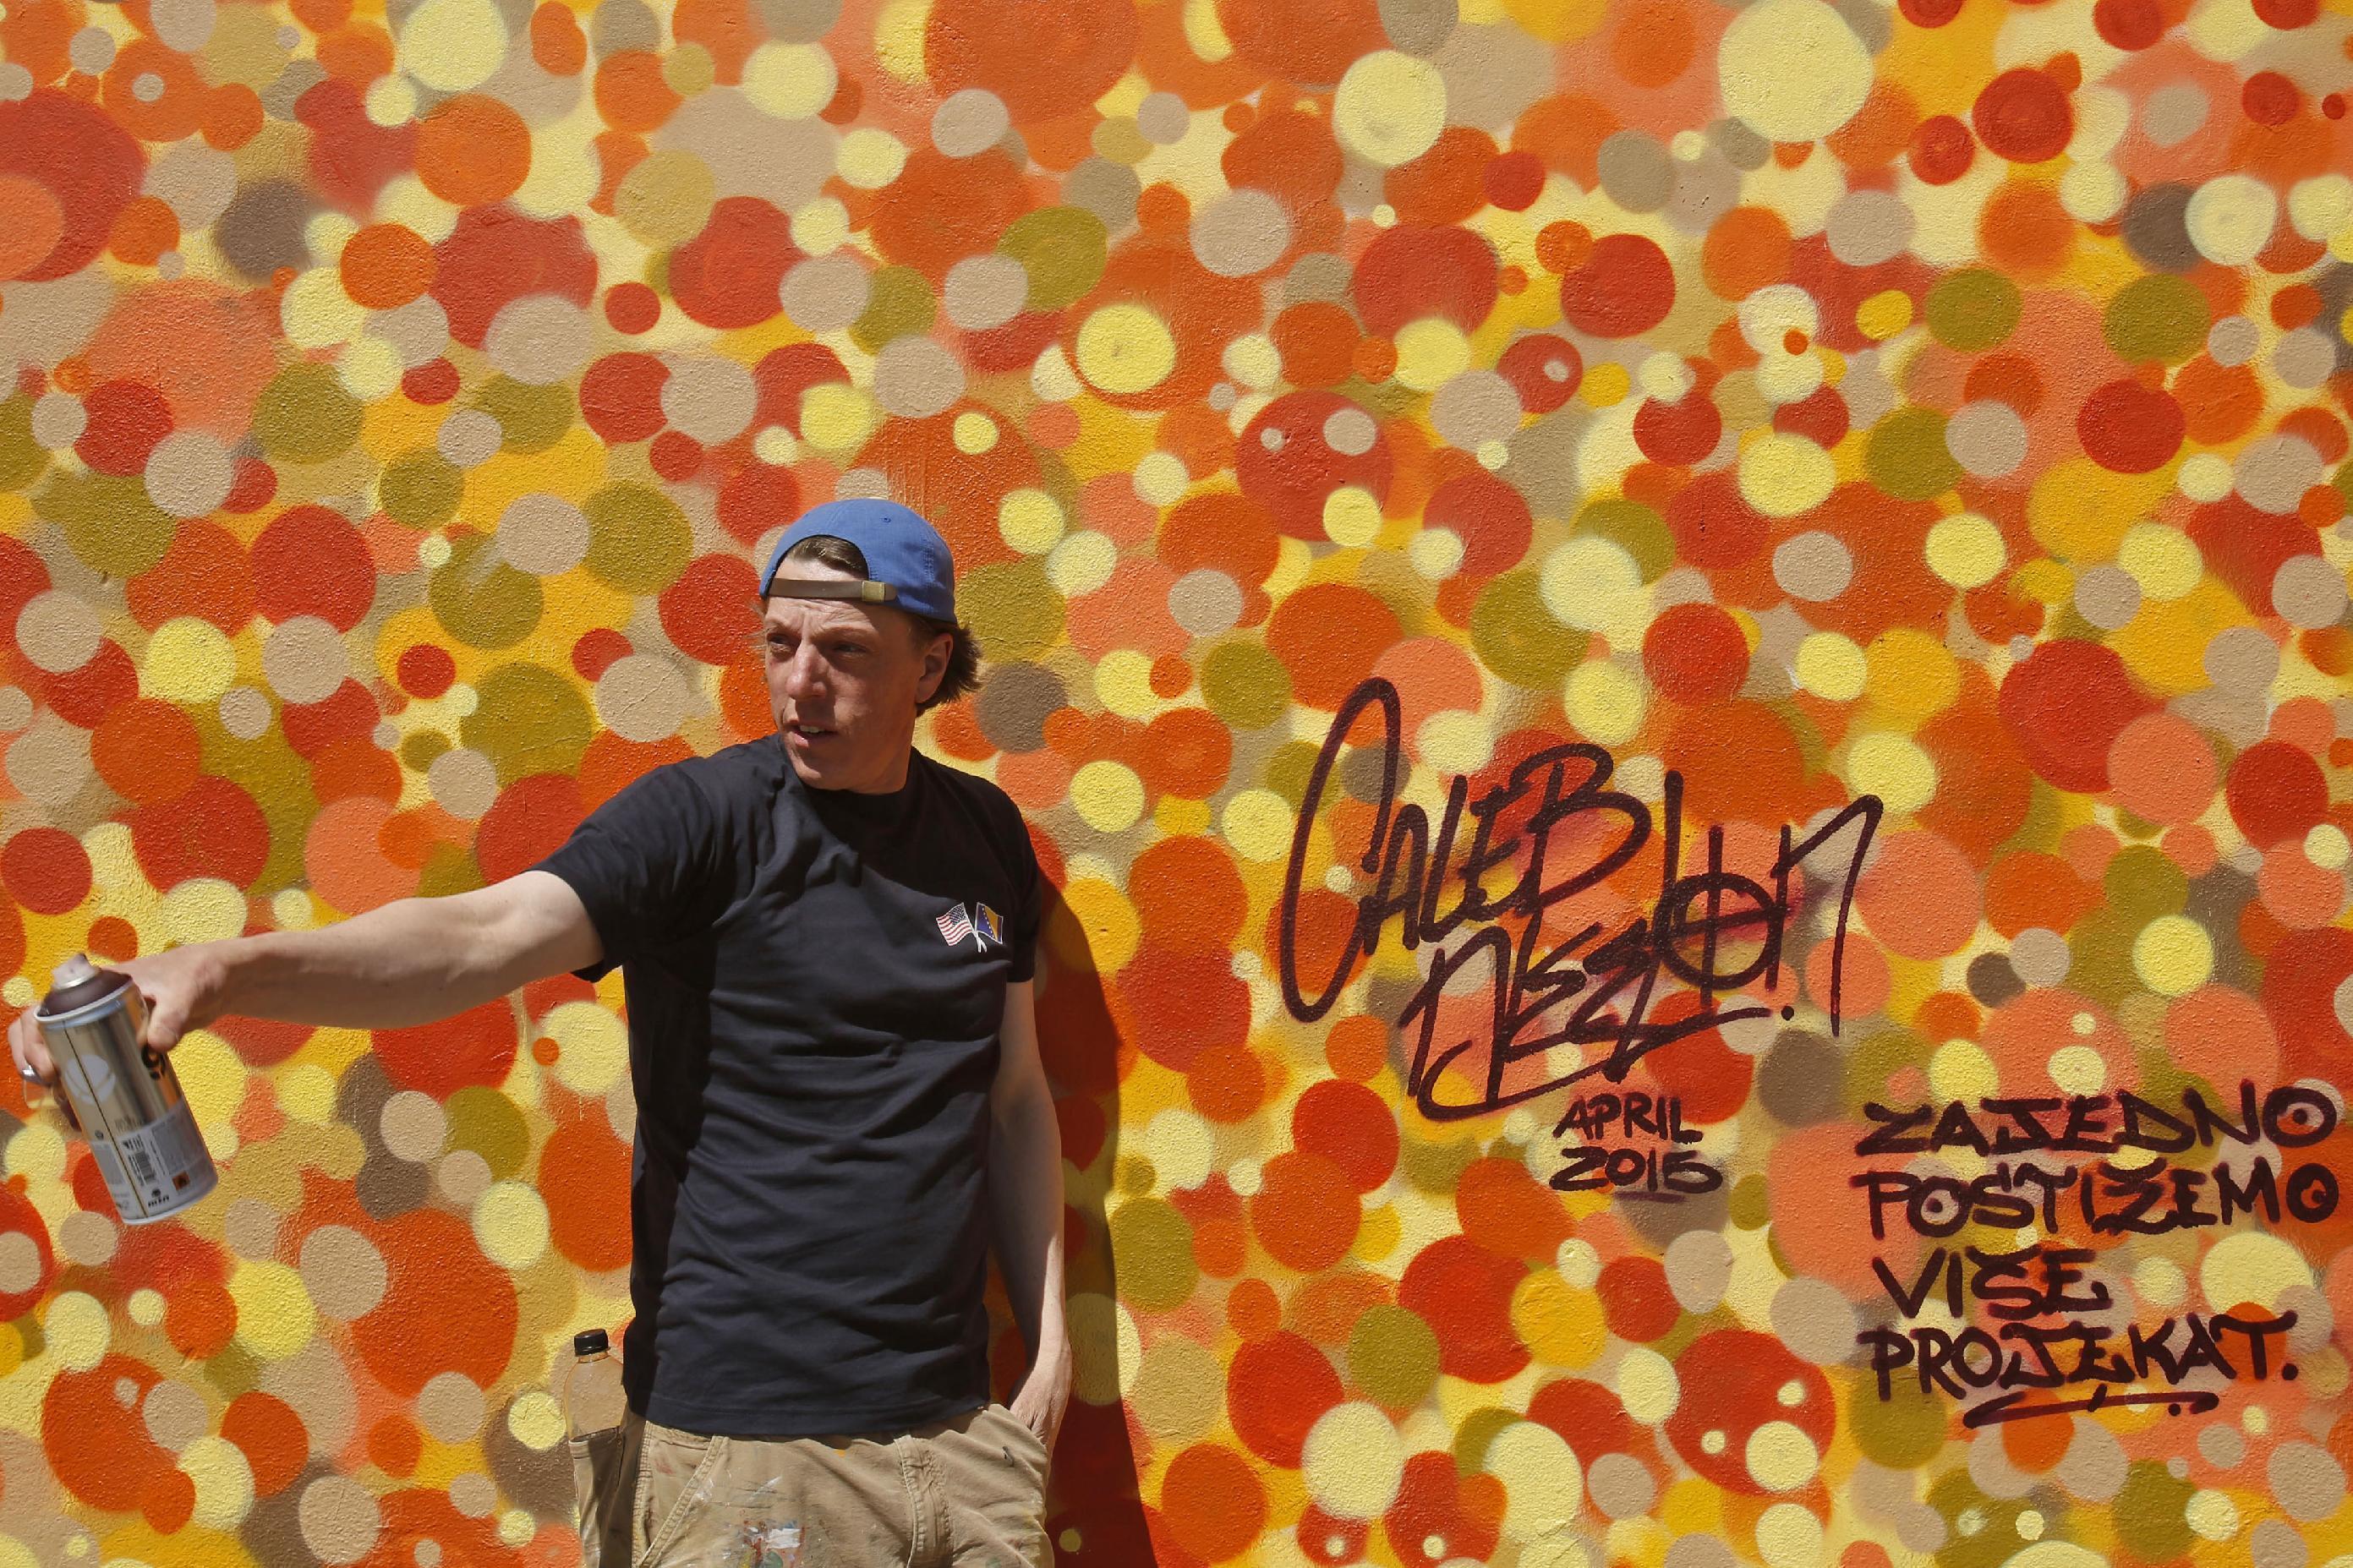 US artist unites divided Bosnian youths to make street art